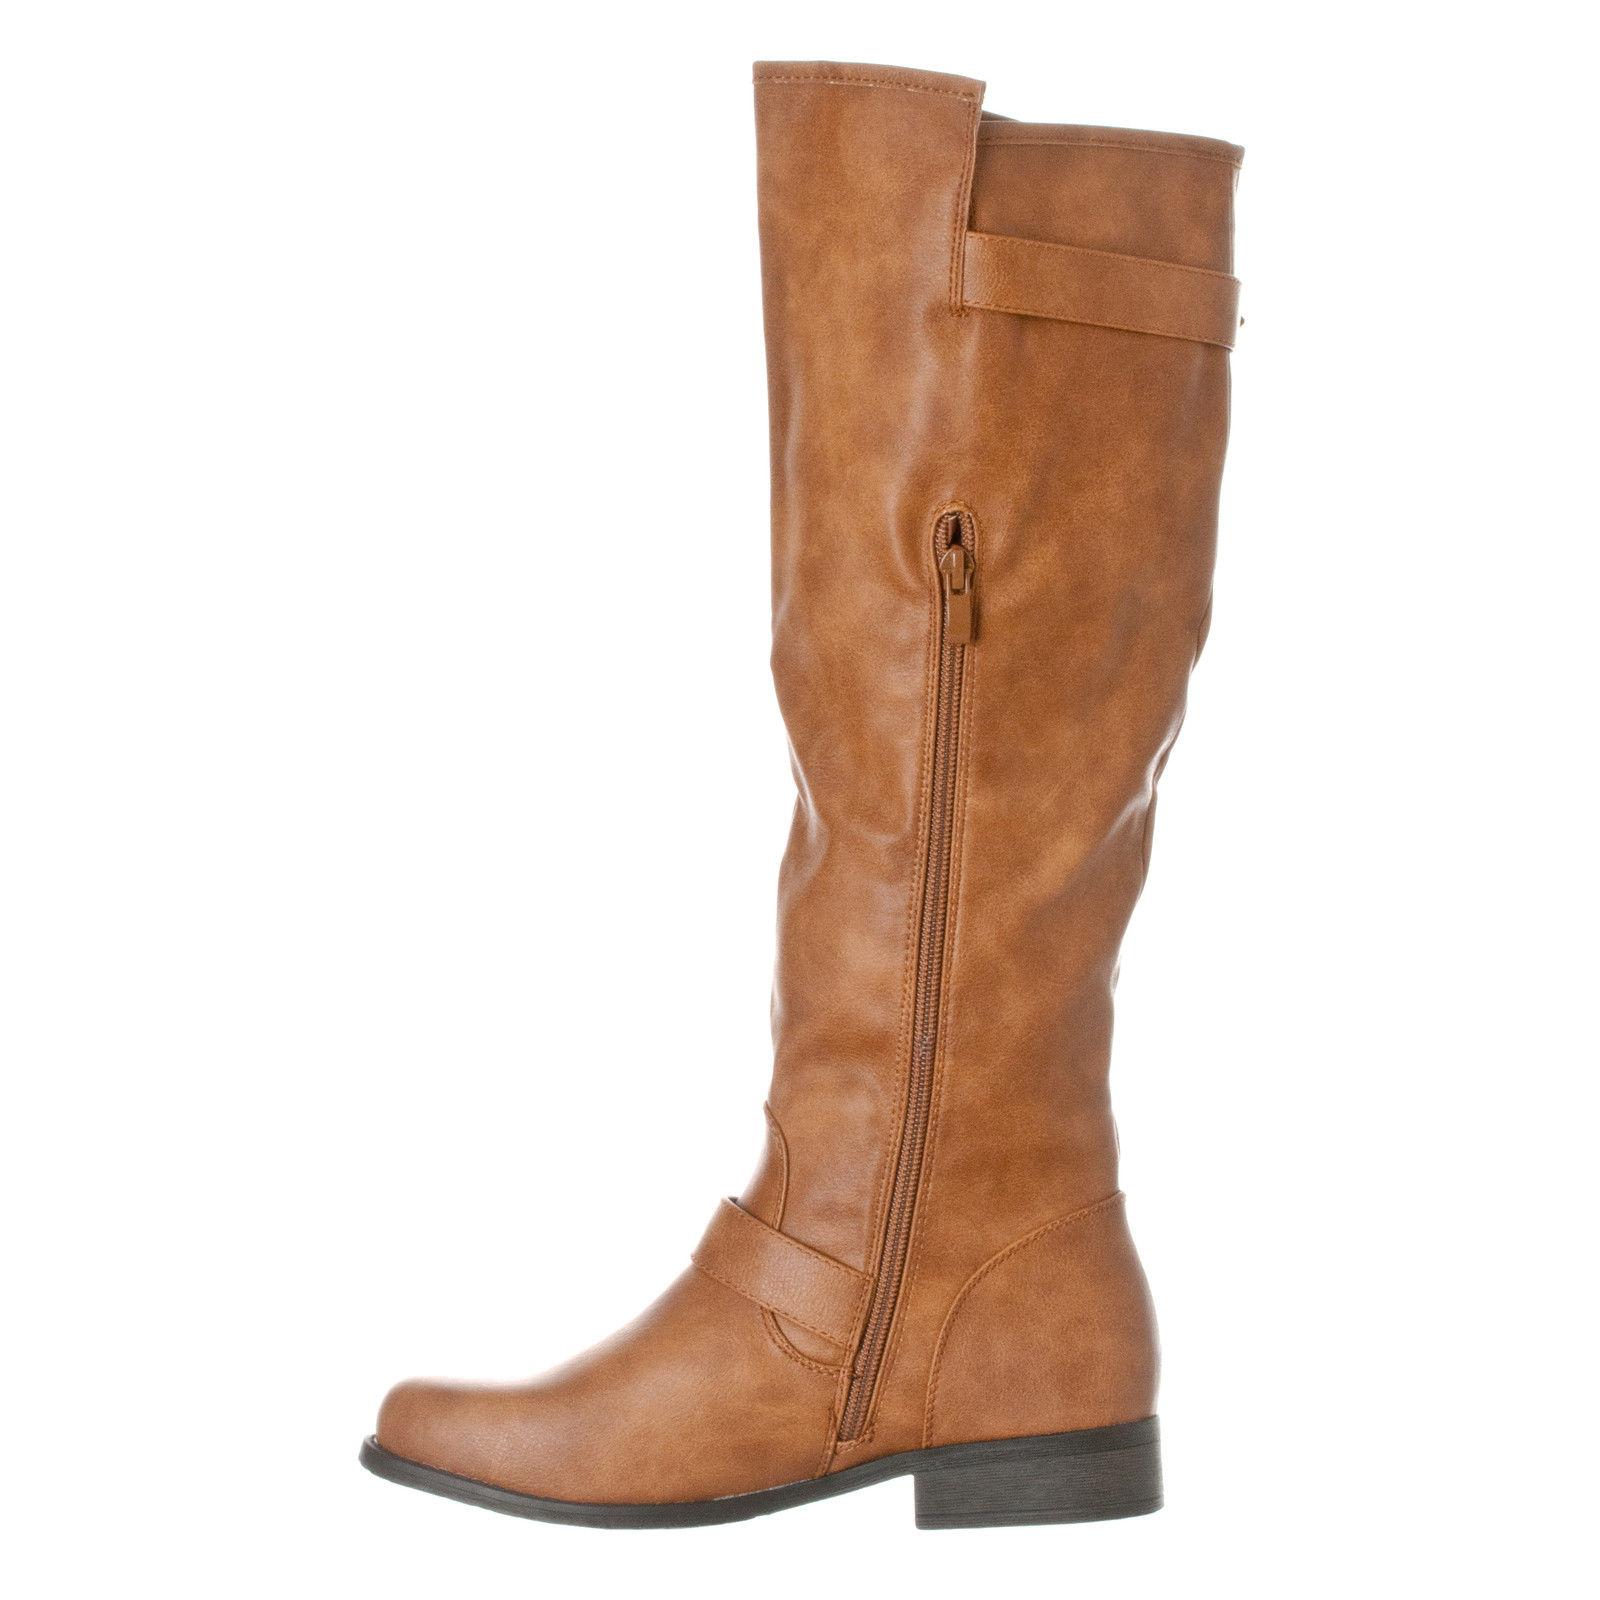 1cd654f11e0 Riverberry Women s  Mia  Knee-High Riding Boots - Tan - Size  7.5 ...